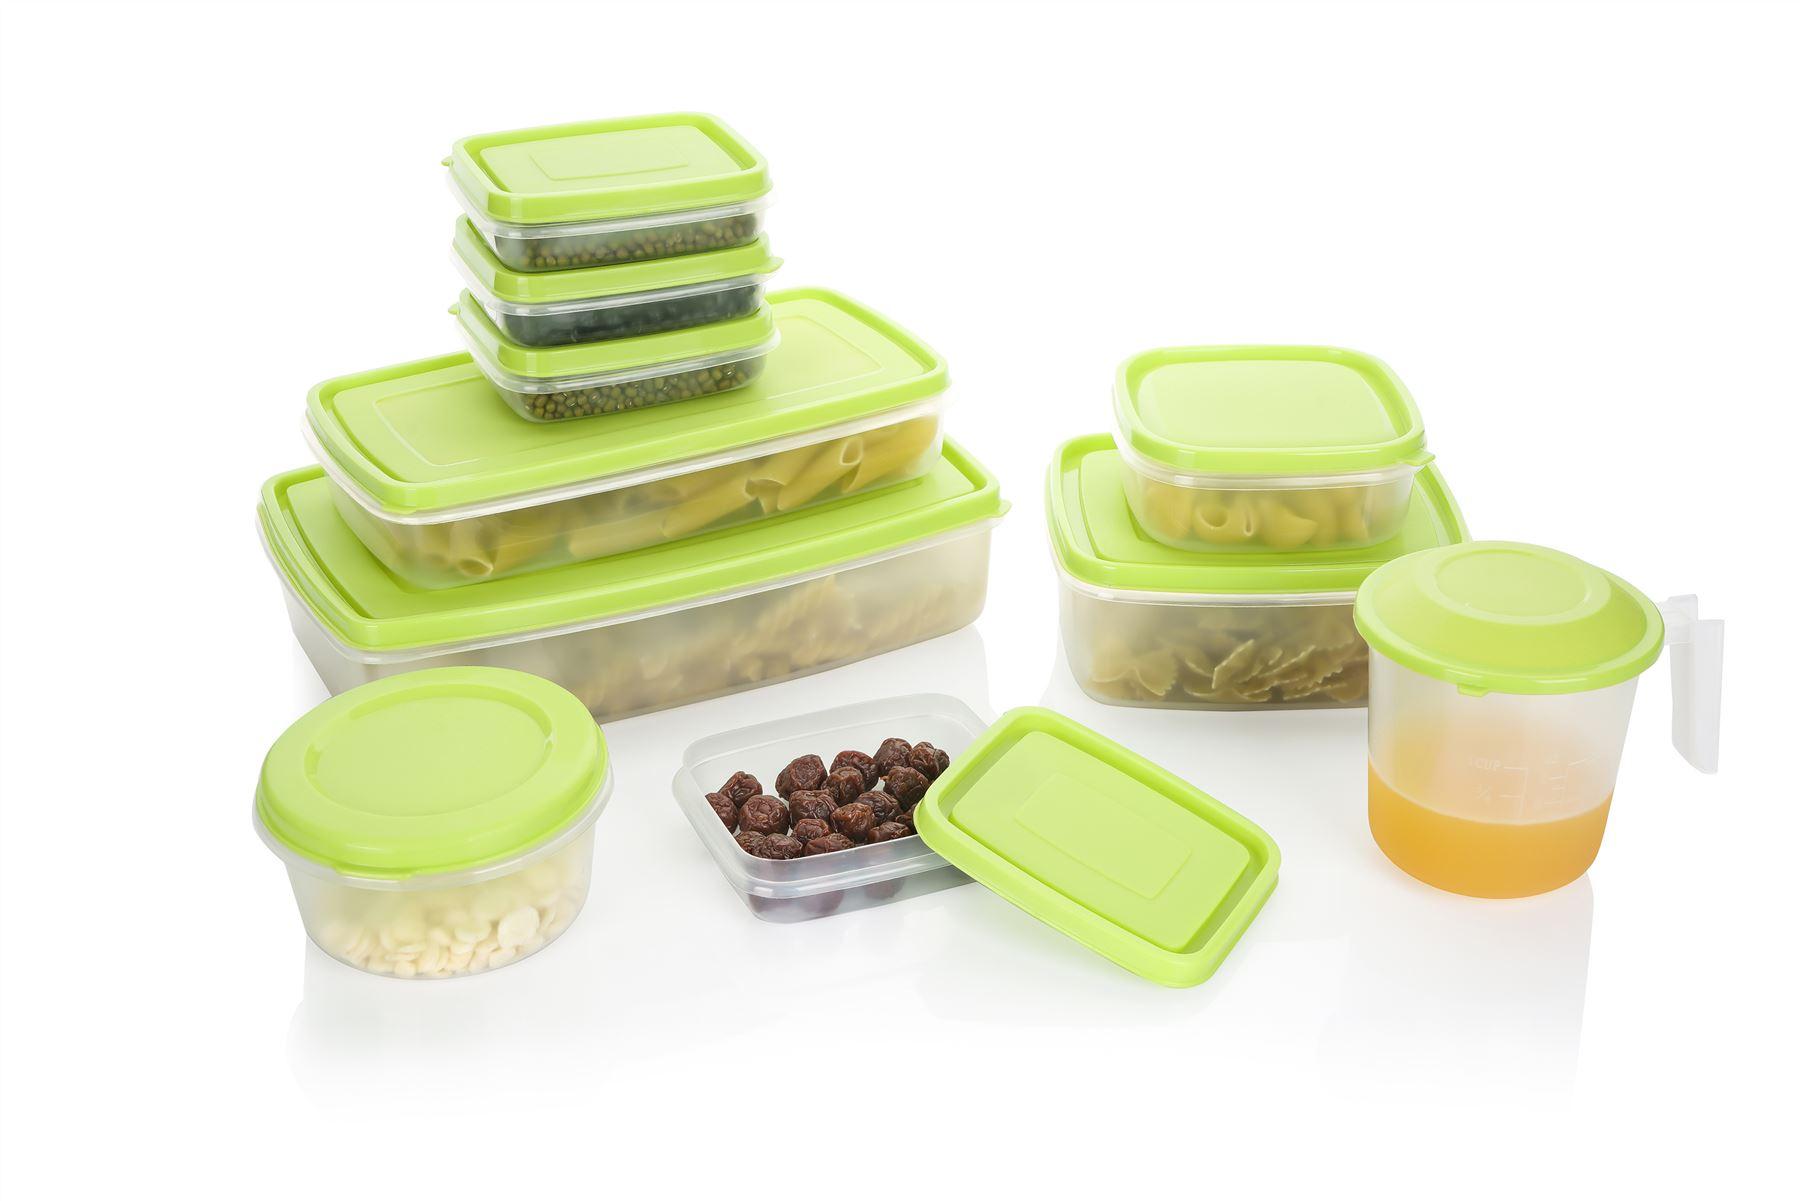 Attractive Freezer Safe Storage Containers Part - 7: Sentinel Vinsani 20pcs Microwave Food Storage Container Set - Dishwasher U0026 Freezer  Safe